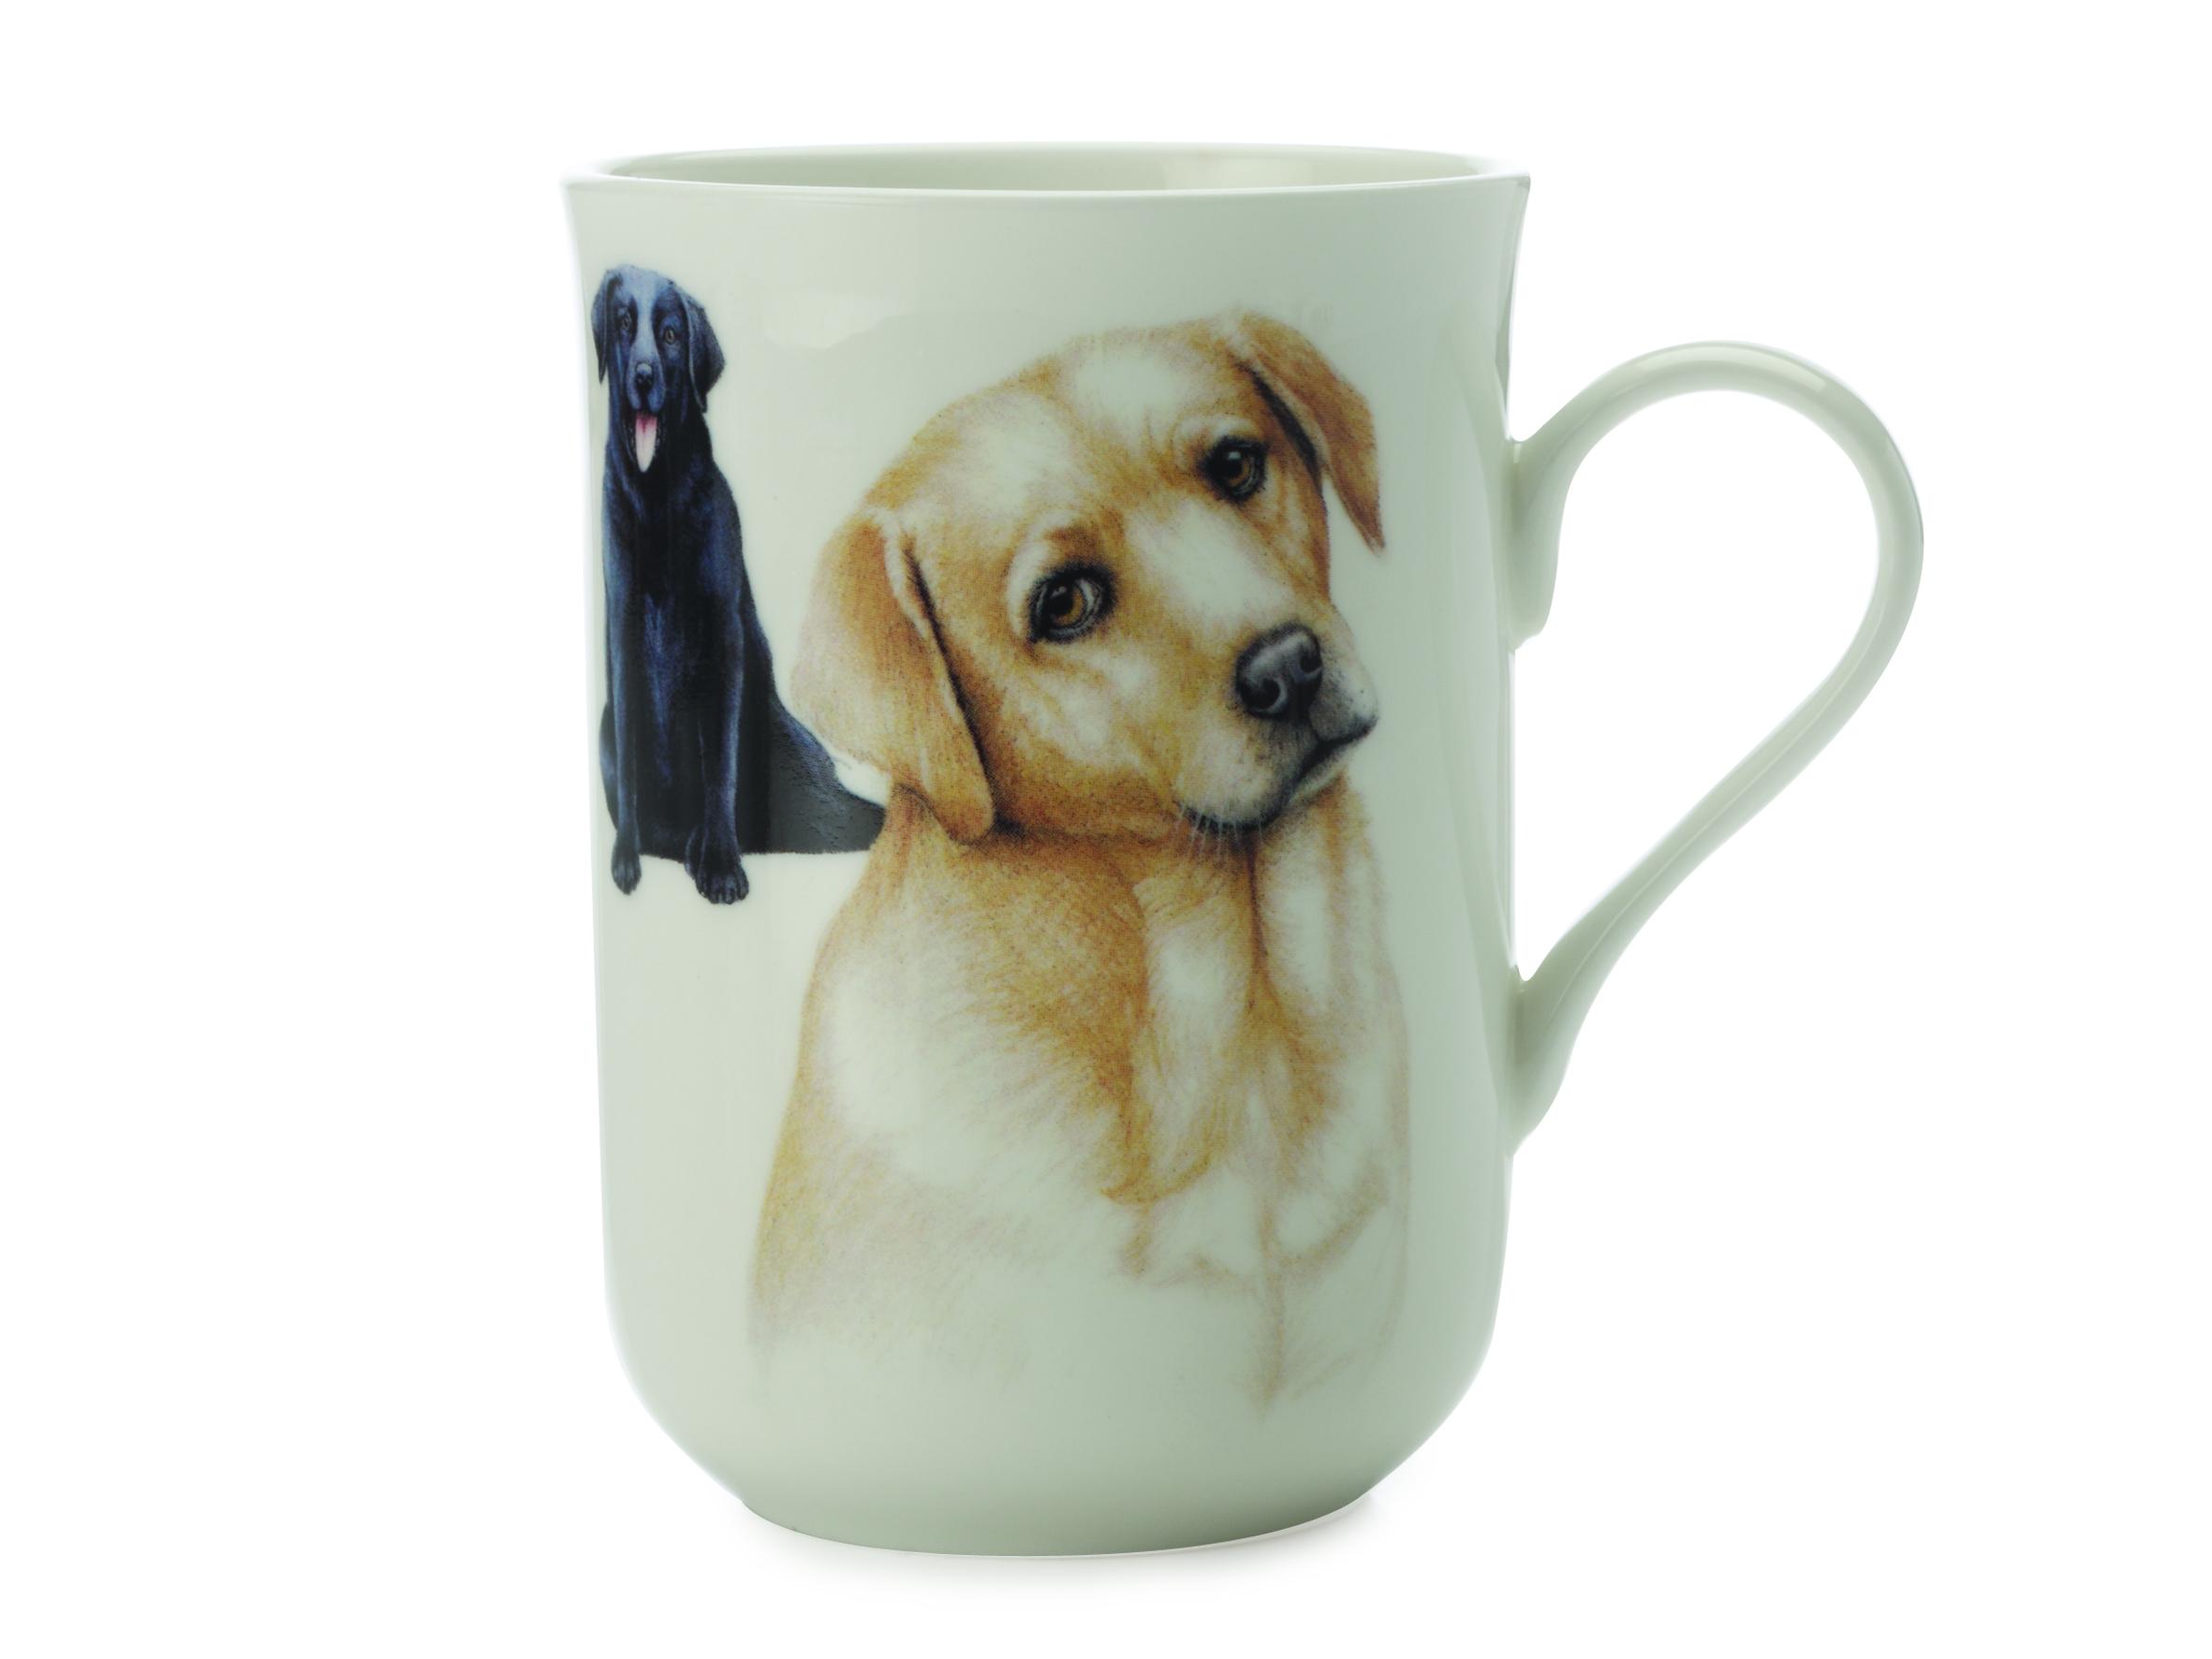 Cana Labrador, Pets, 300 ml title=Cana Labrador, Pets, 300 ml